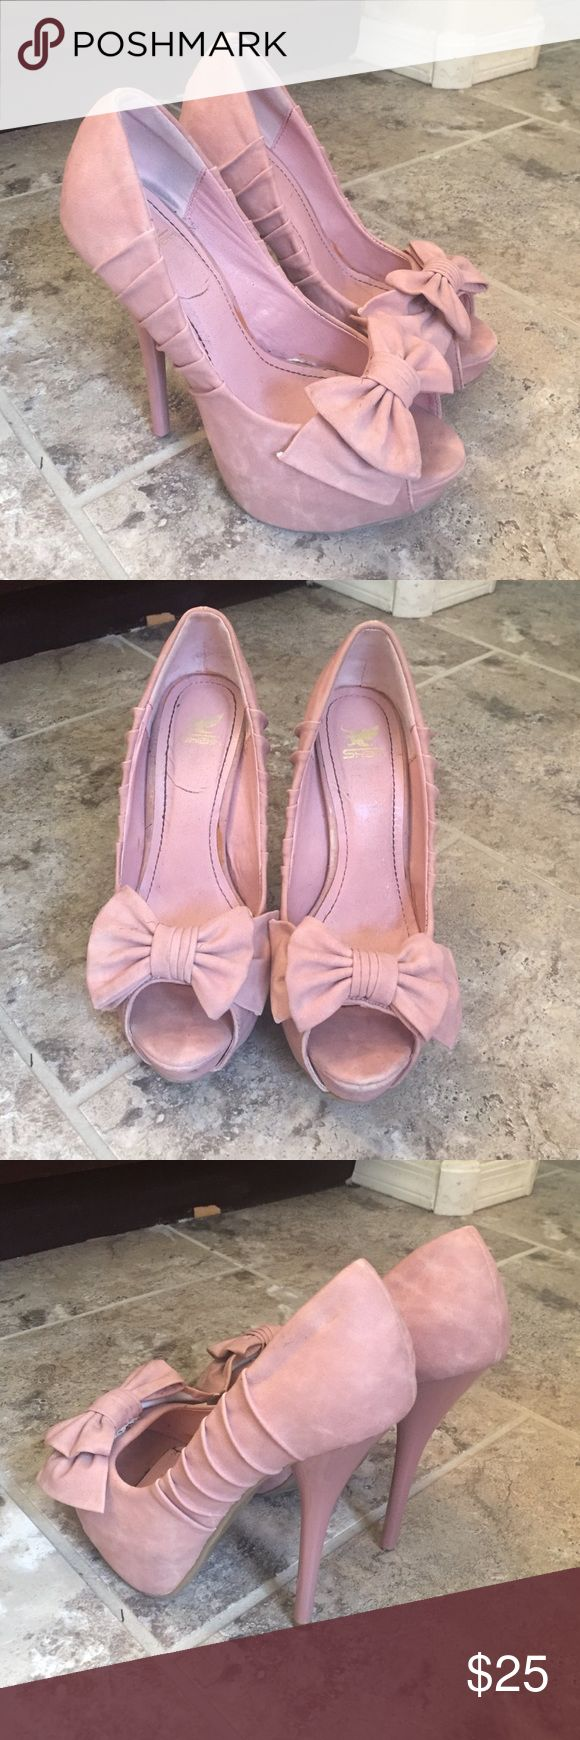 1000 Ideas About Light Pink Heels On Pinterest Pink